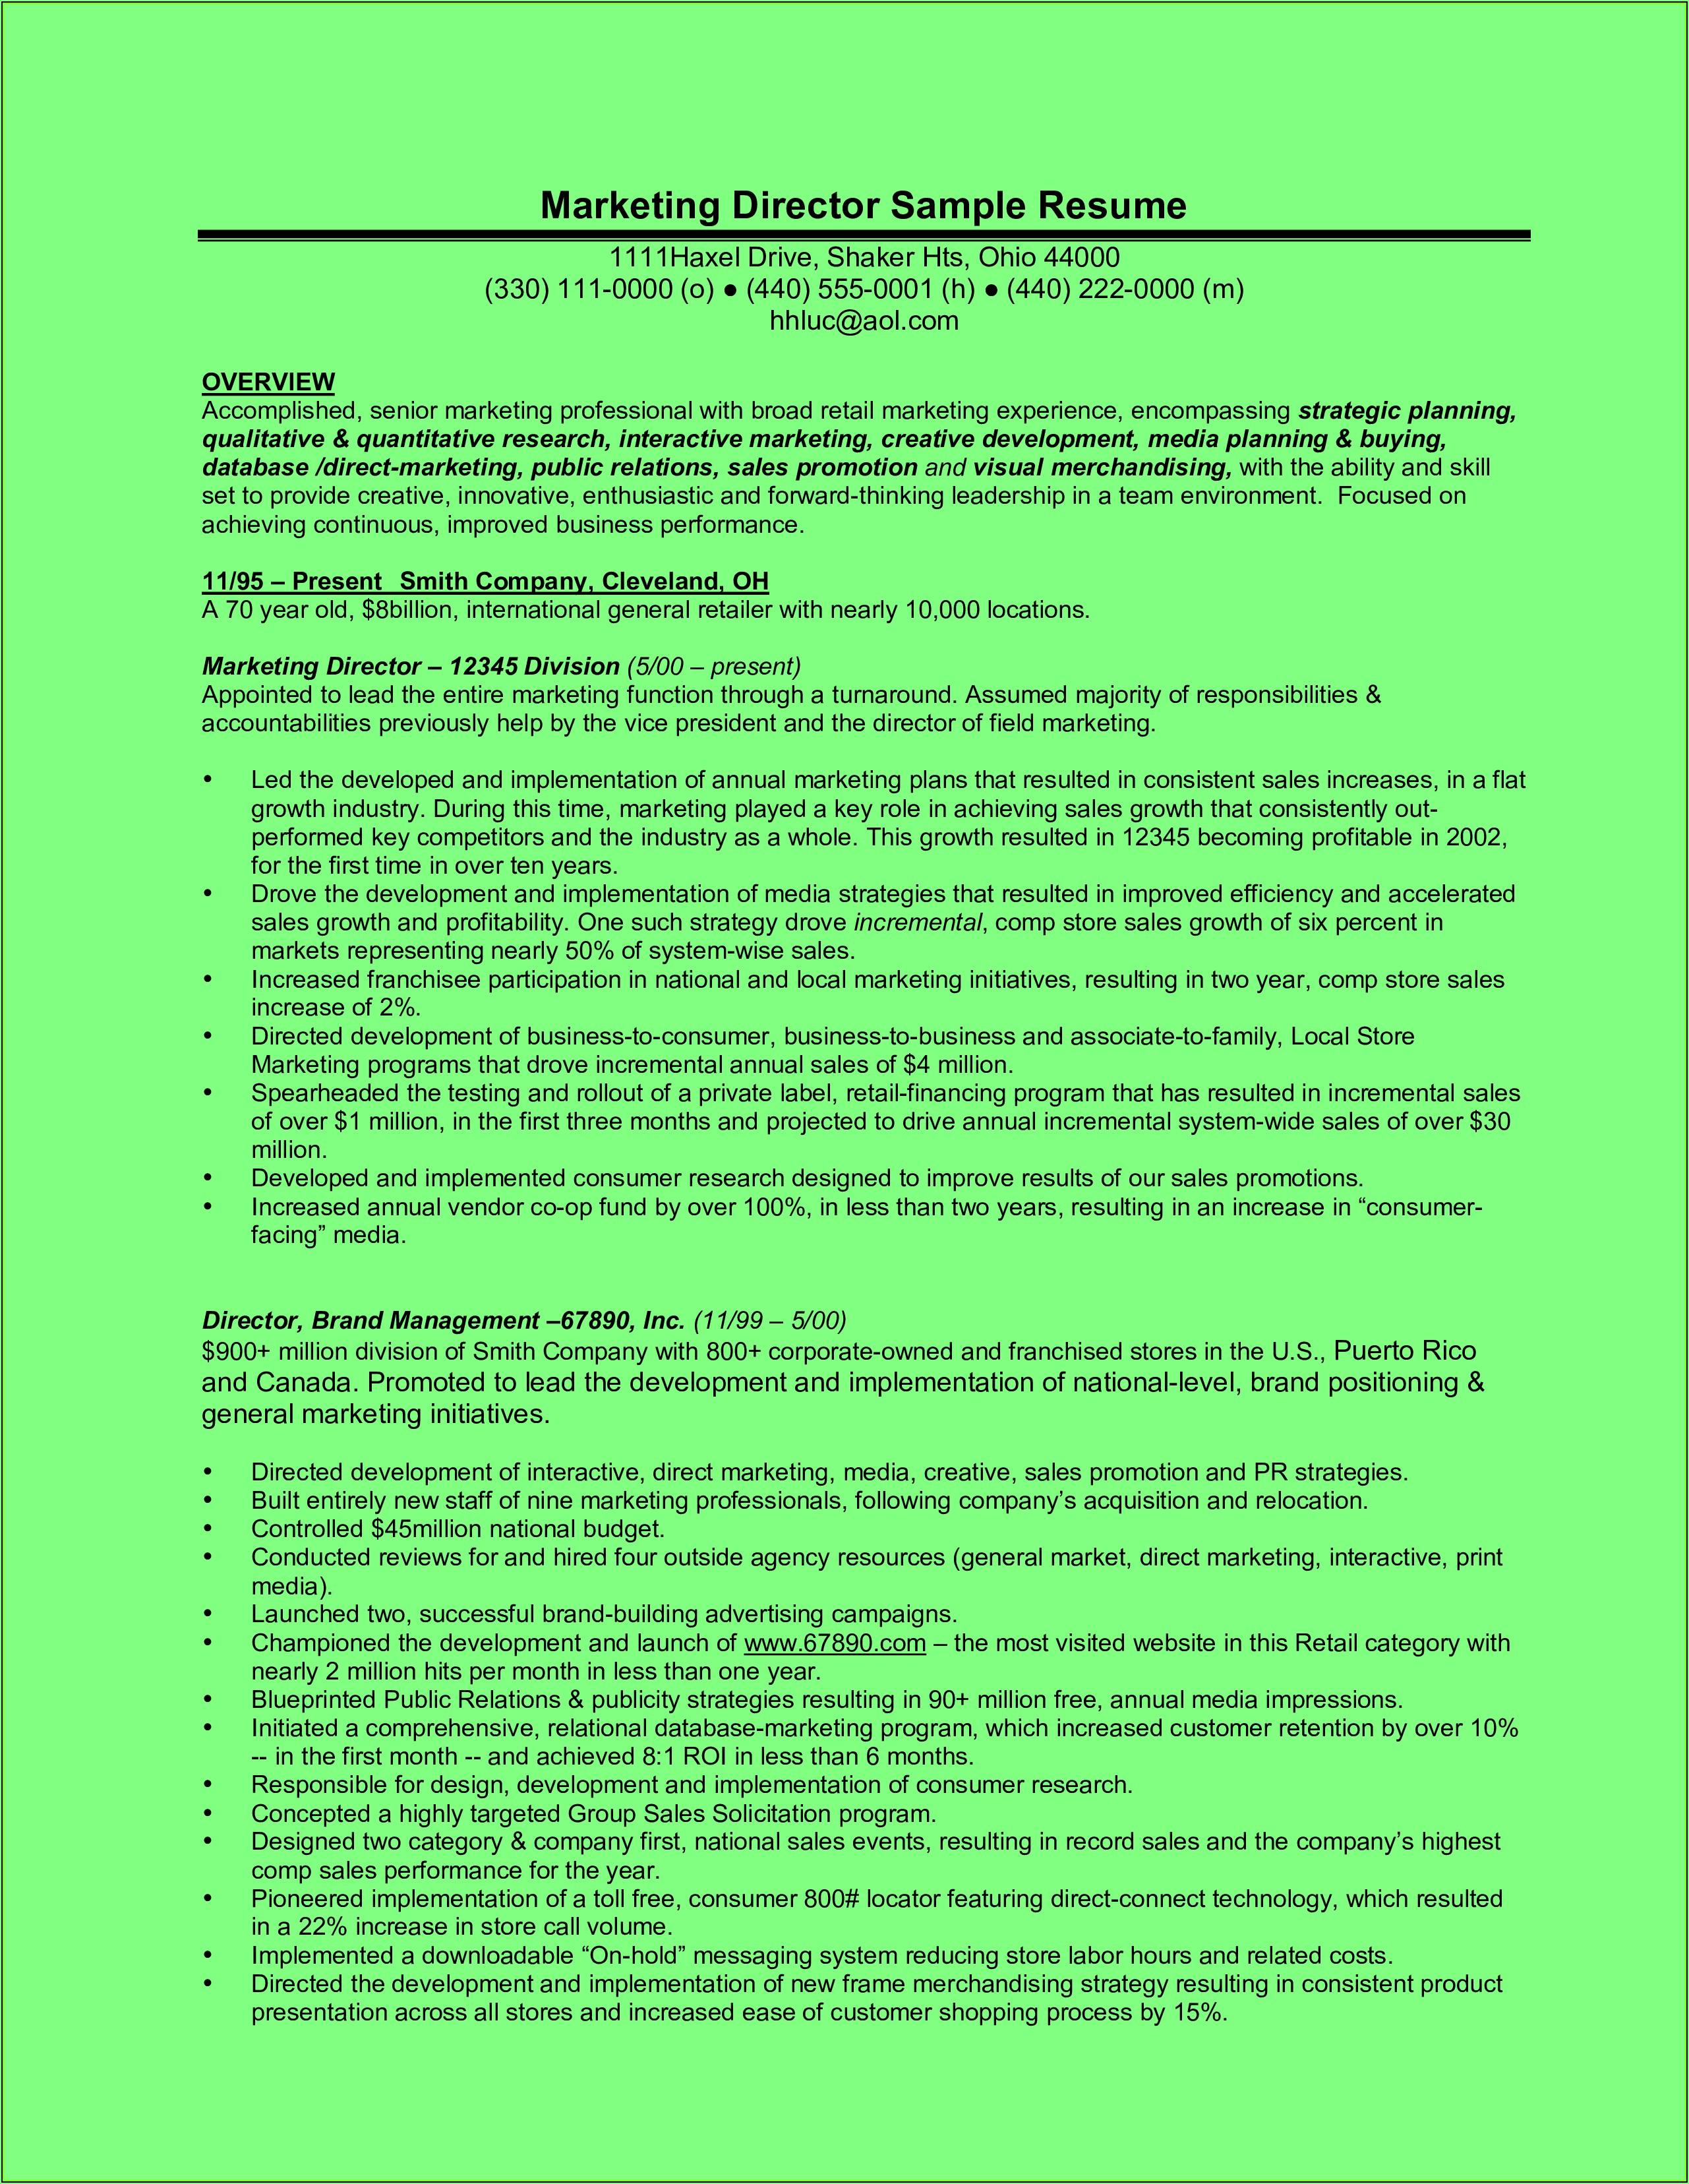 Resume Templates Executive Director